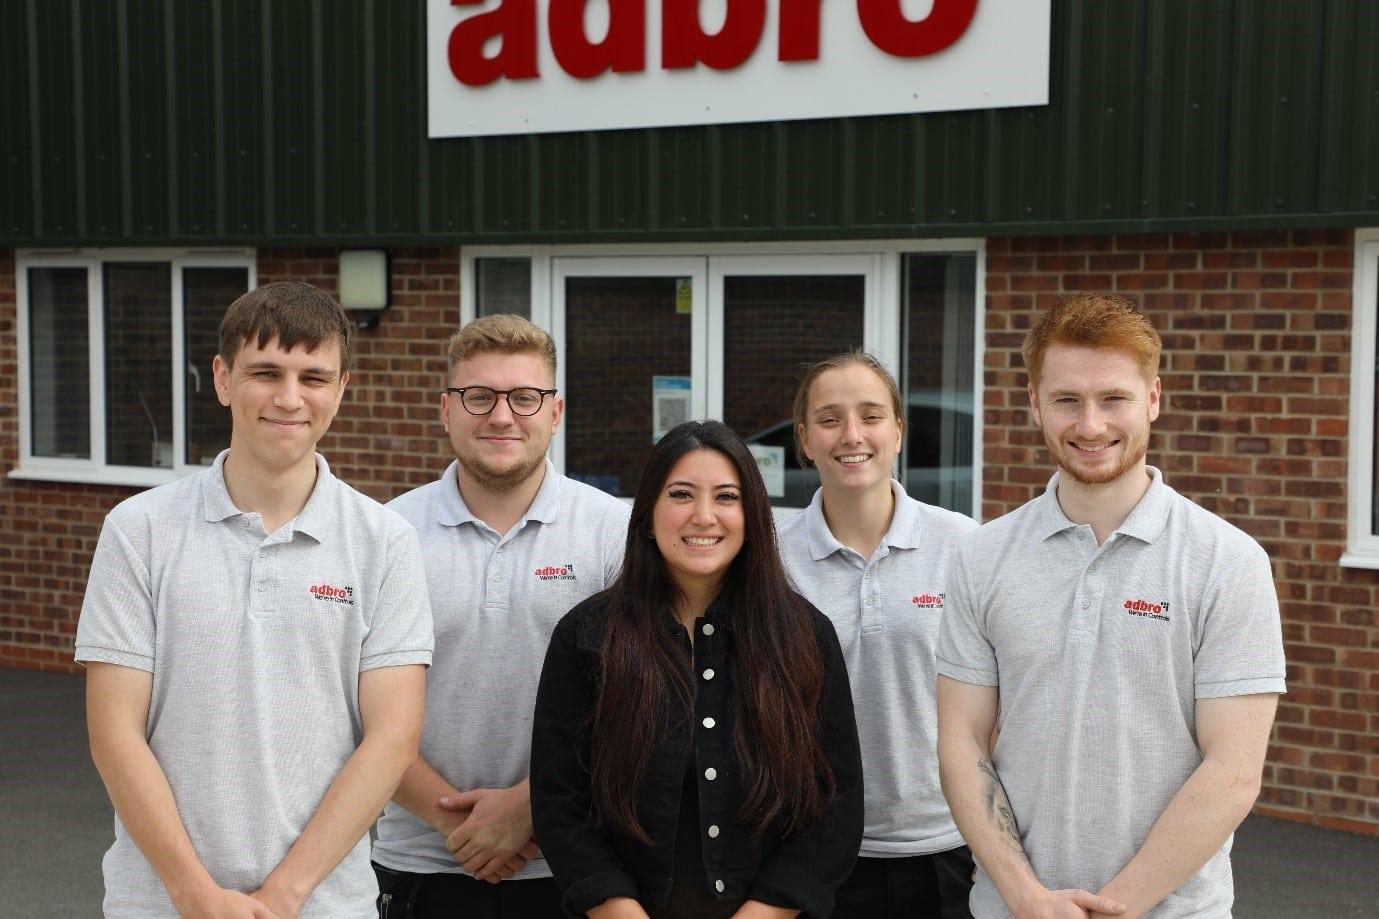 Adbro Controls Ltd Apprentices stood outside building